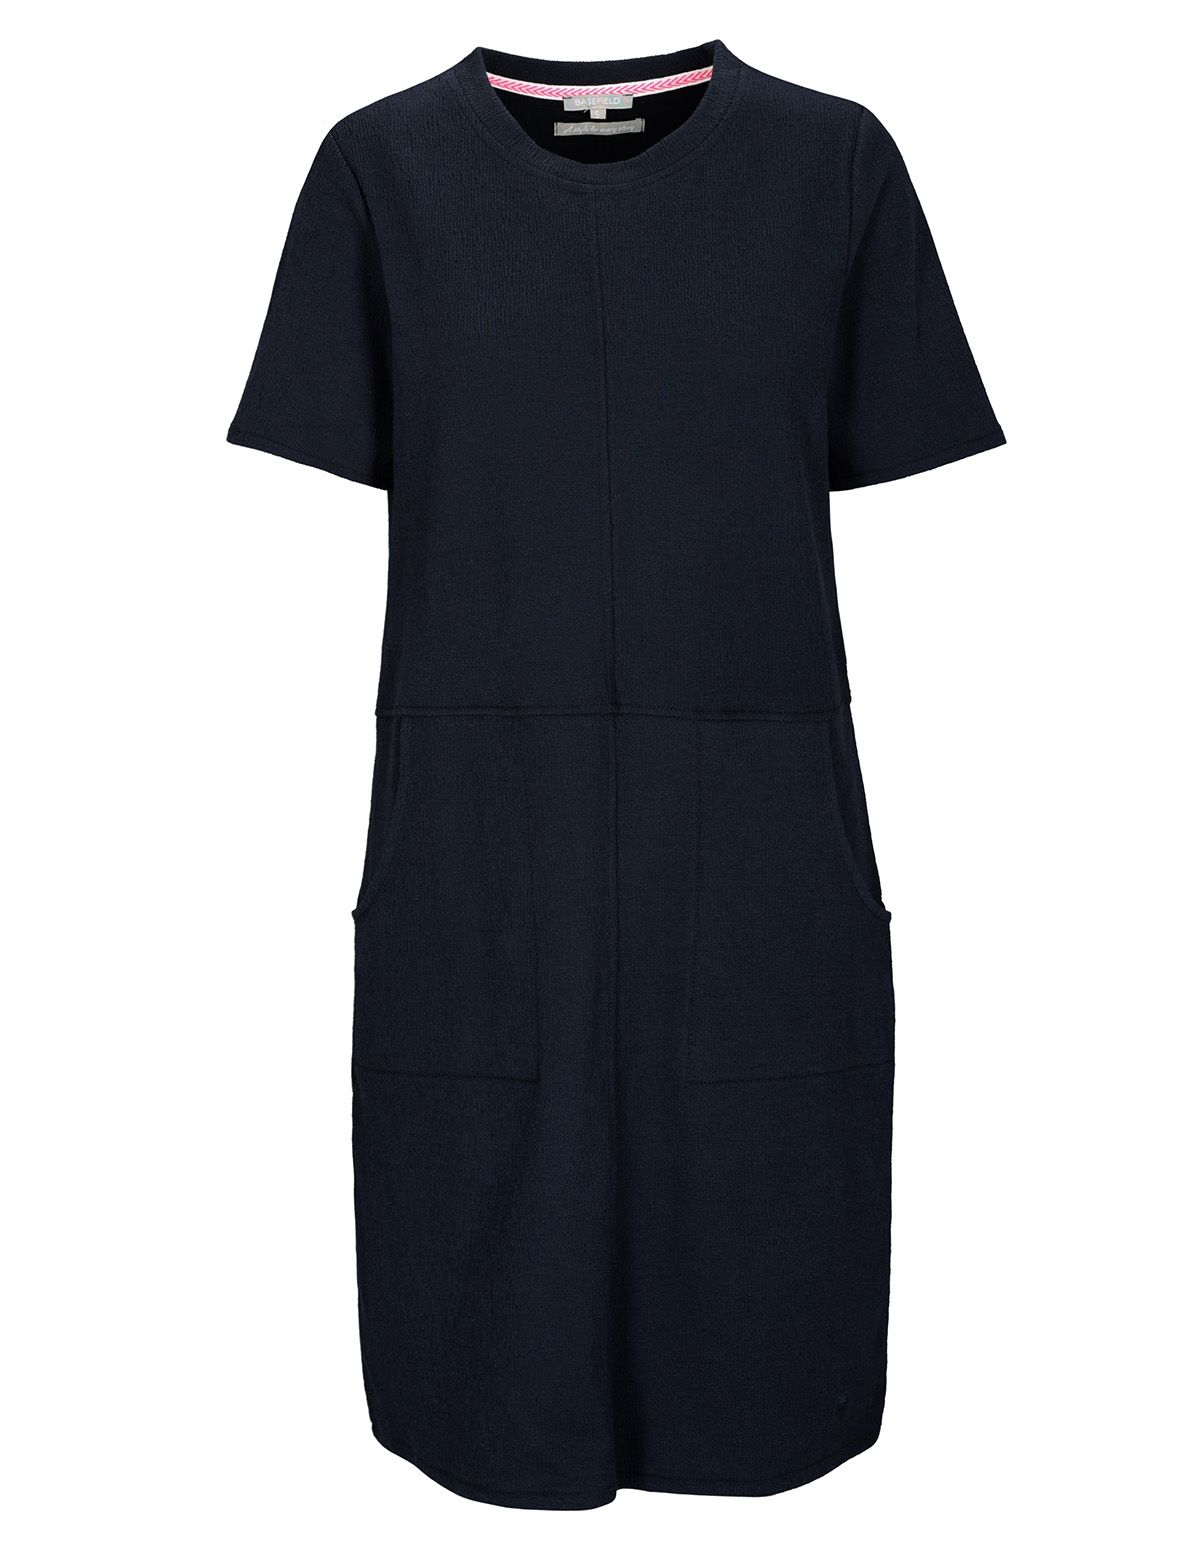 Kleid mit Strukturmuster - Blue Navy